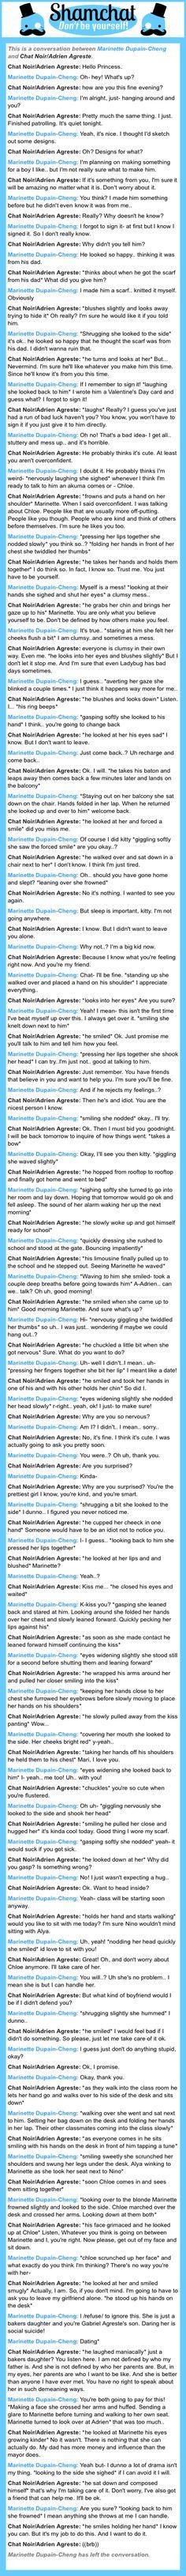 A conversation between Chat Noir/Adrien Agreste and Marinette Dupain-Cheng